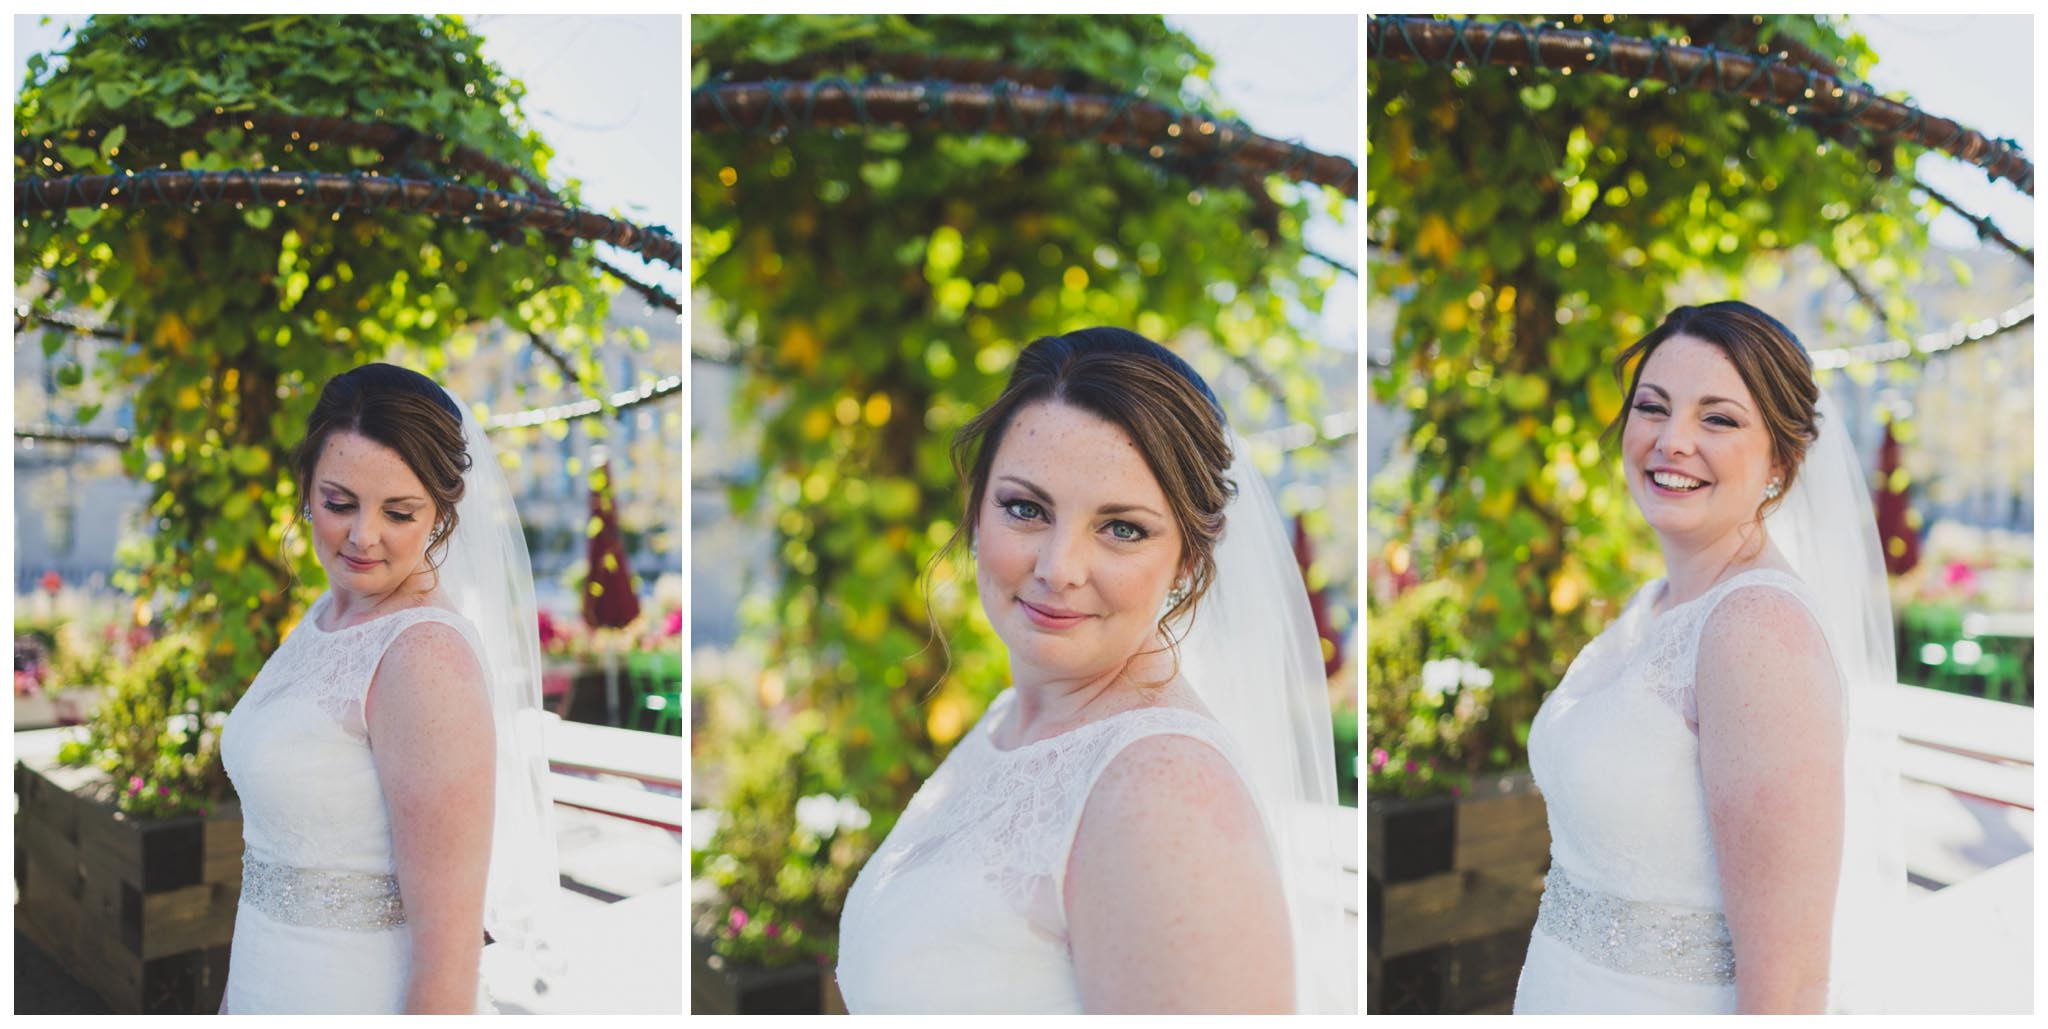 30th Street Station, The Porch, wedding, Philadelphia